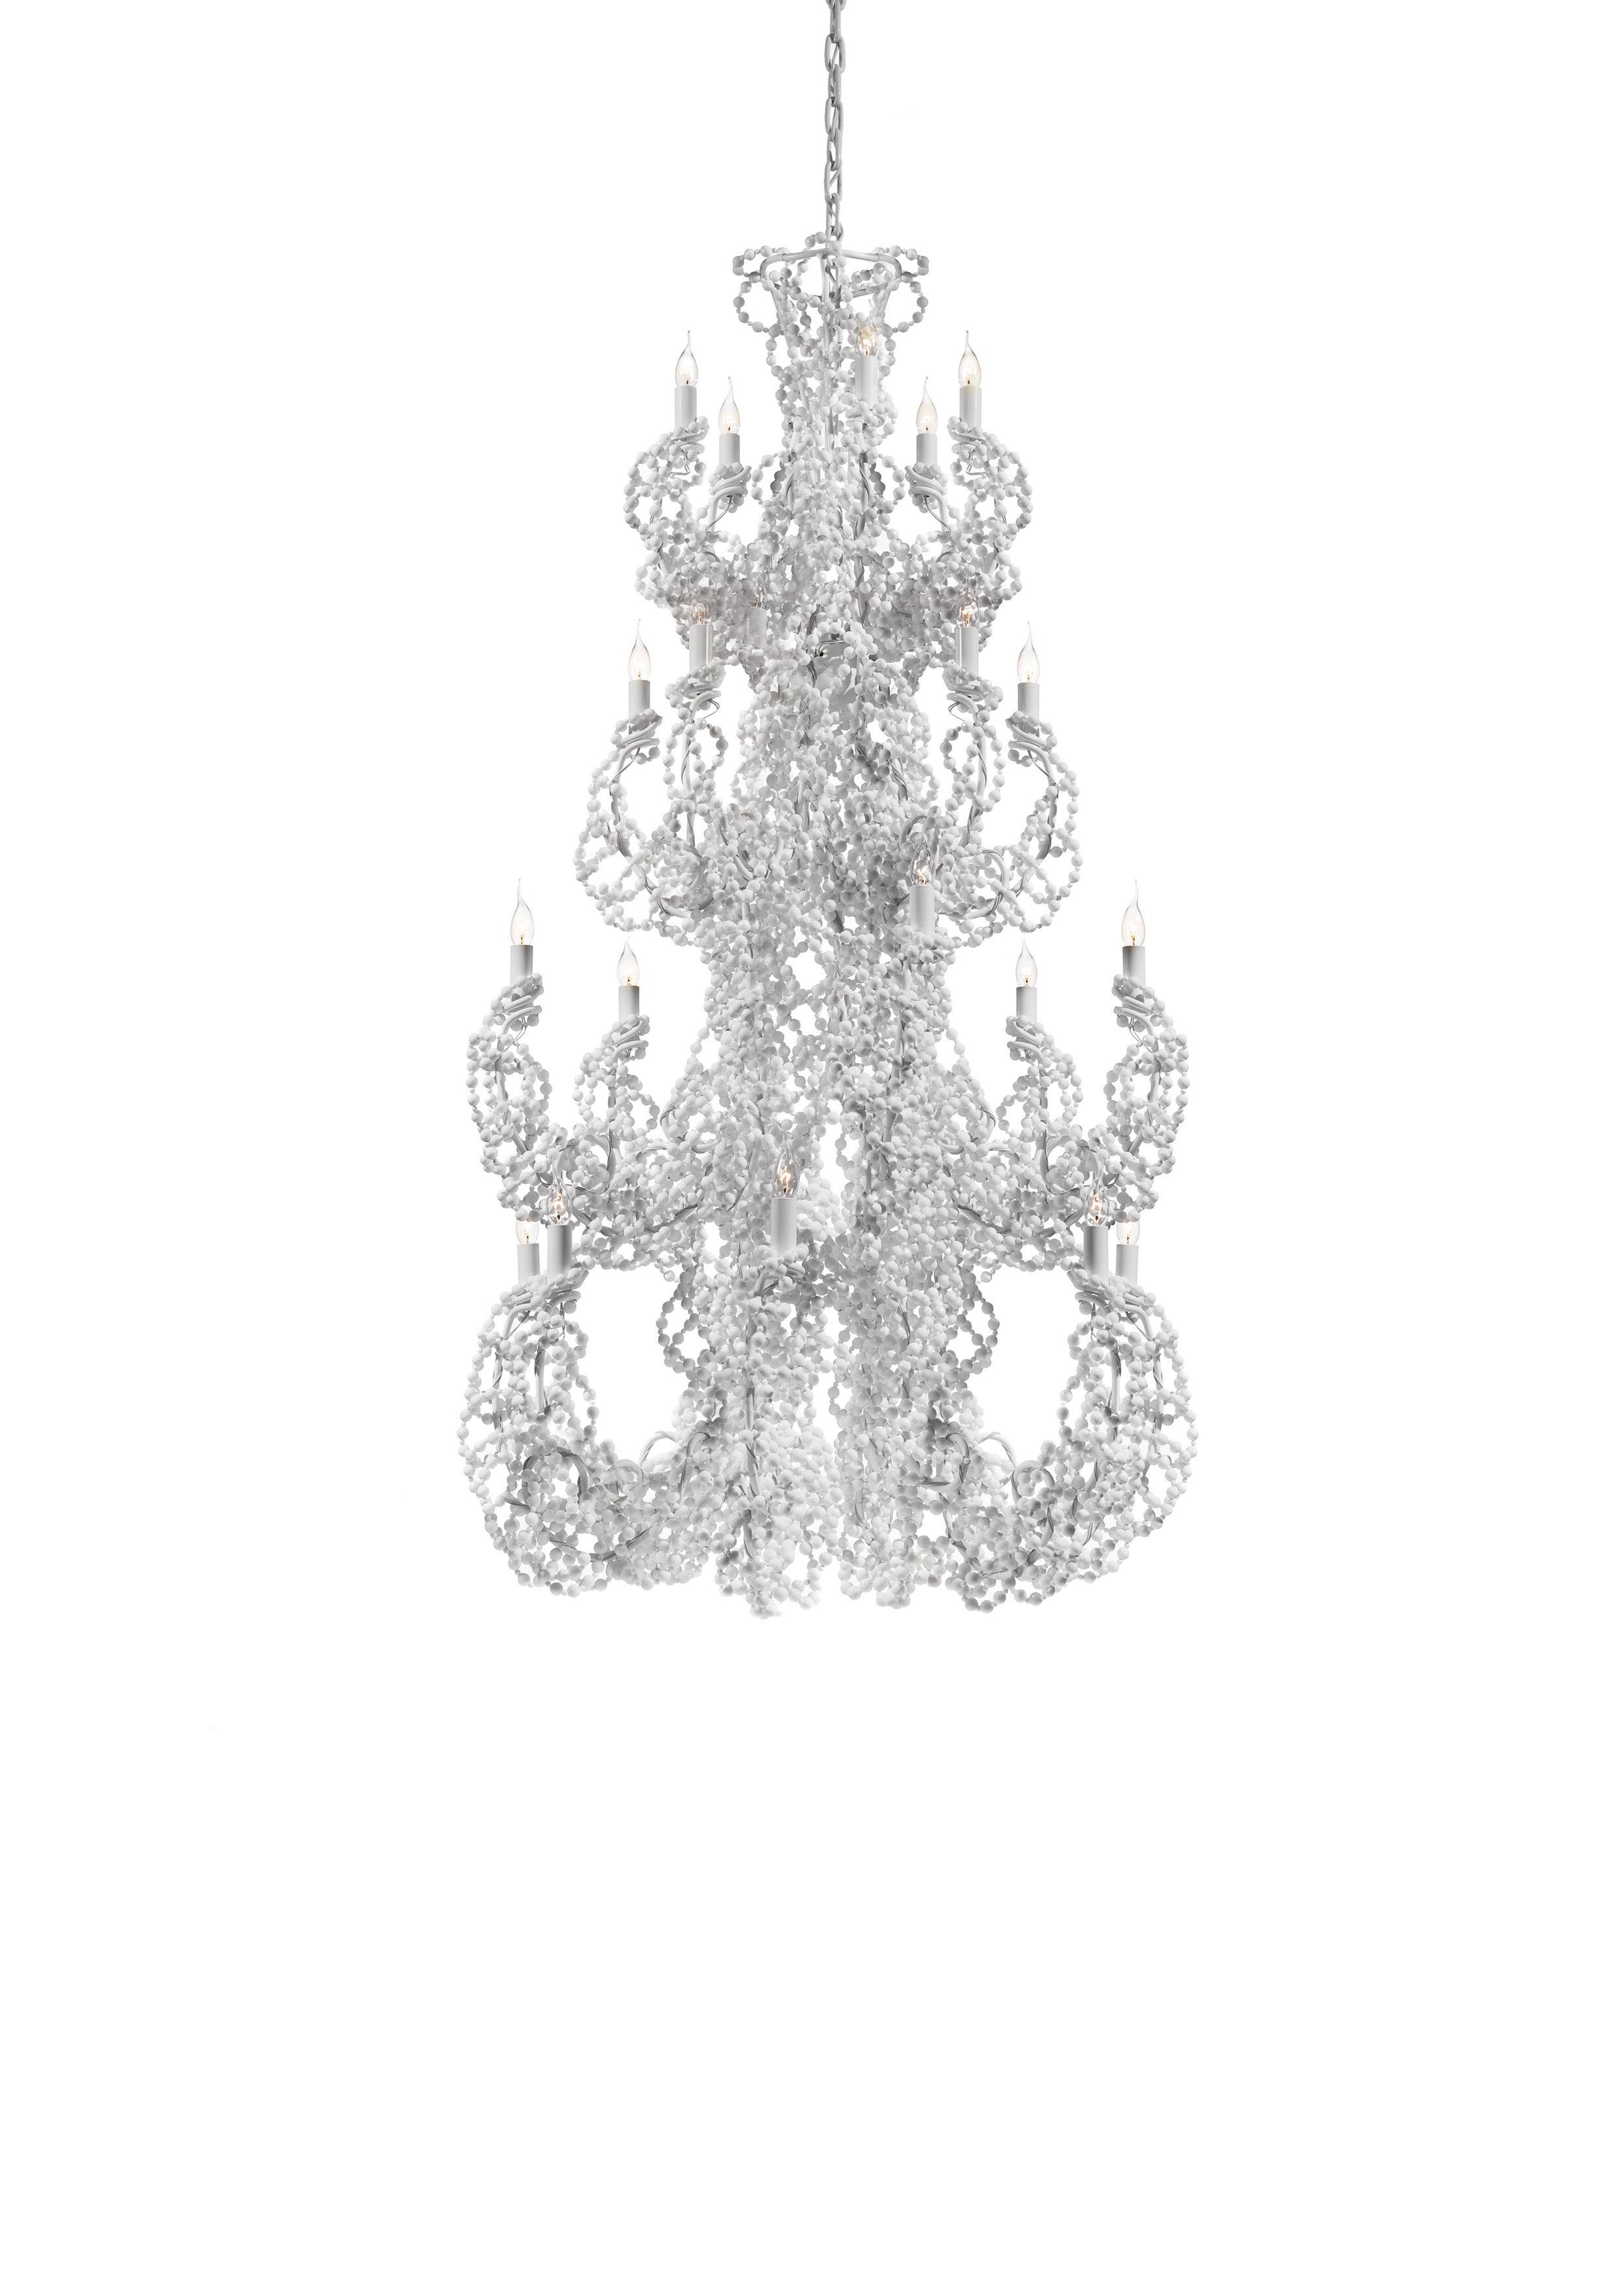 Coco chandelier by brand van egmond stylepark coco chandelier coco chandelier arubaitofo Gallery